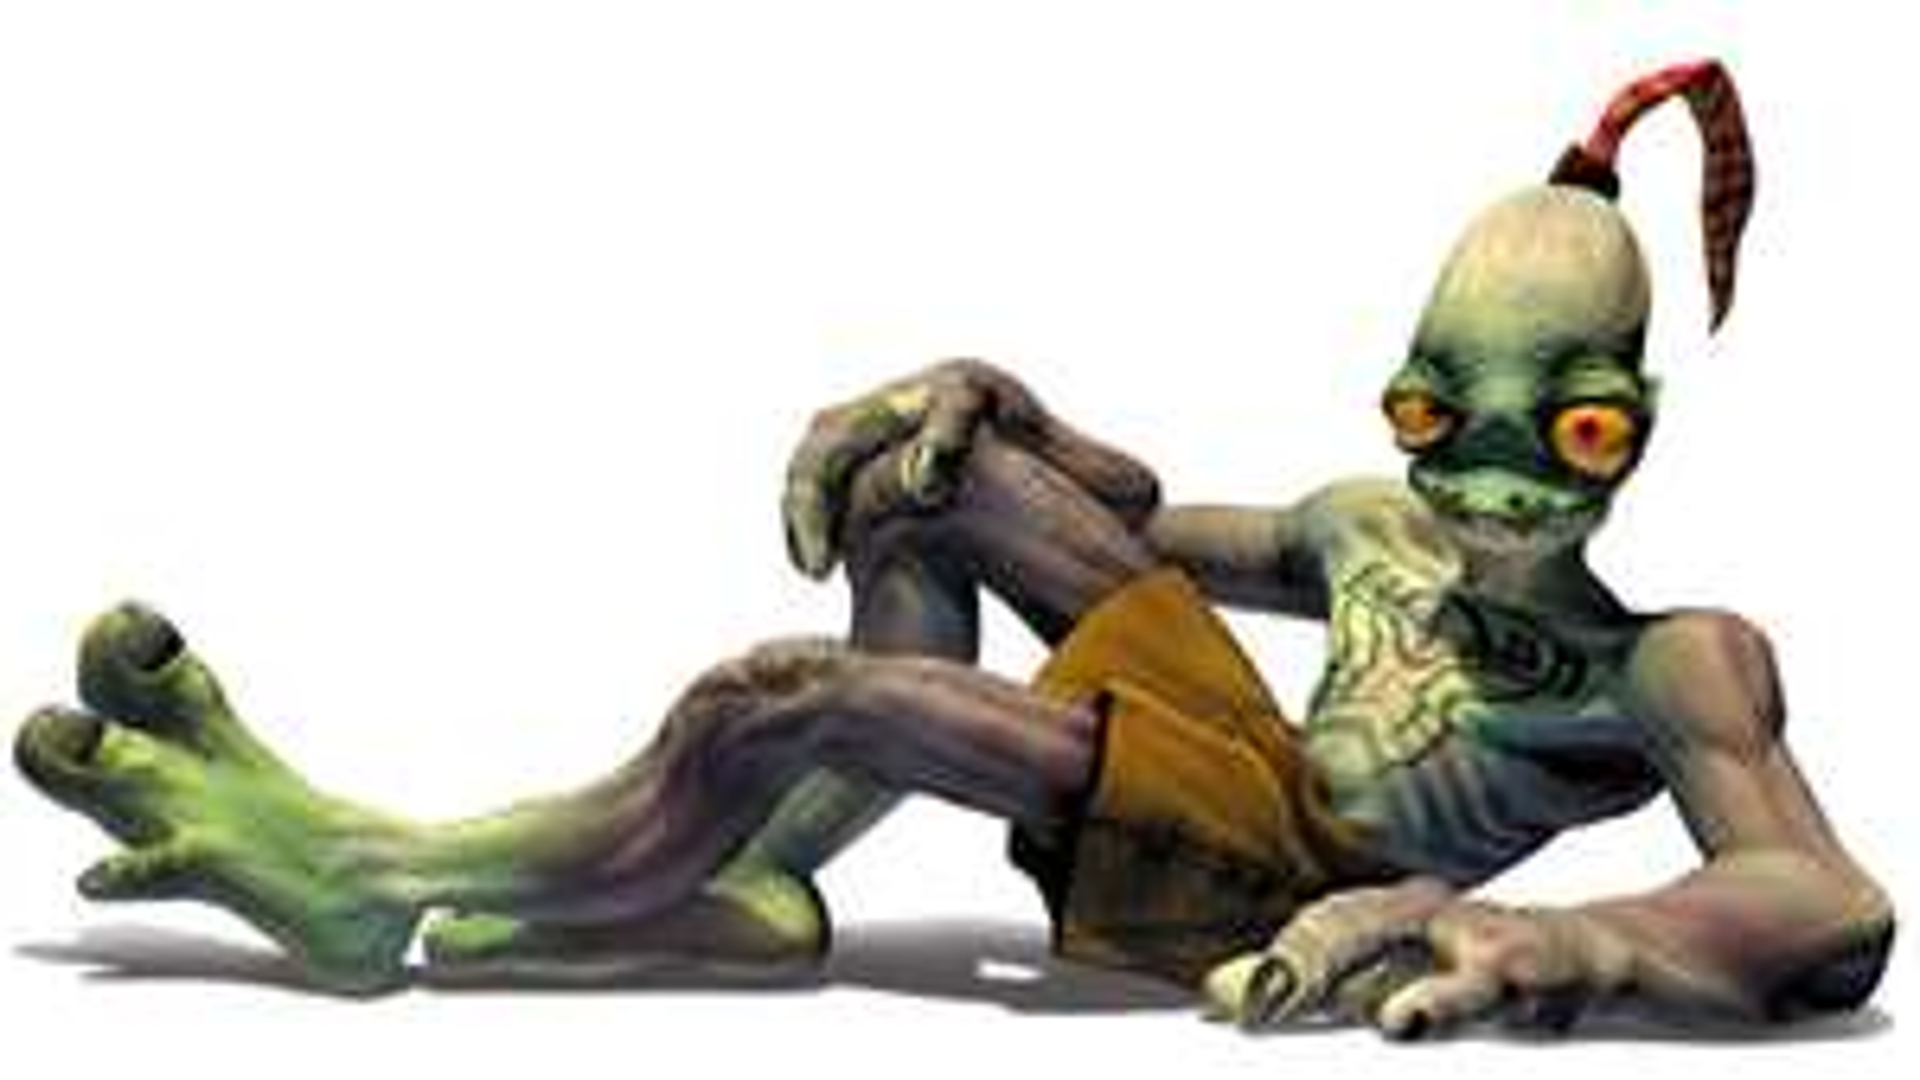 Oddworld: Stranger's Wrath  & Oddworld: Munch's Oddysee = 99p each @ iTunes